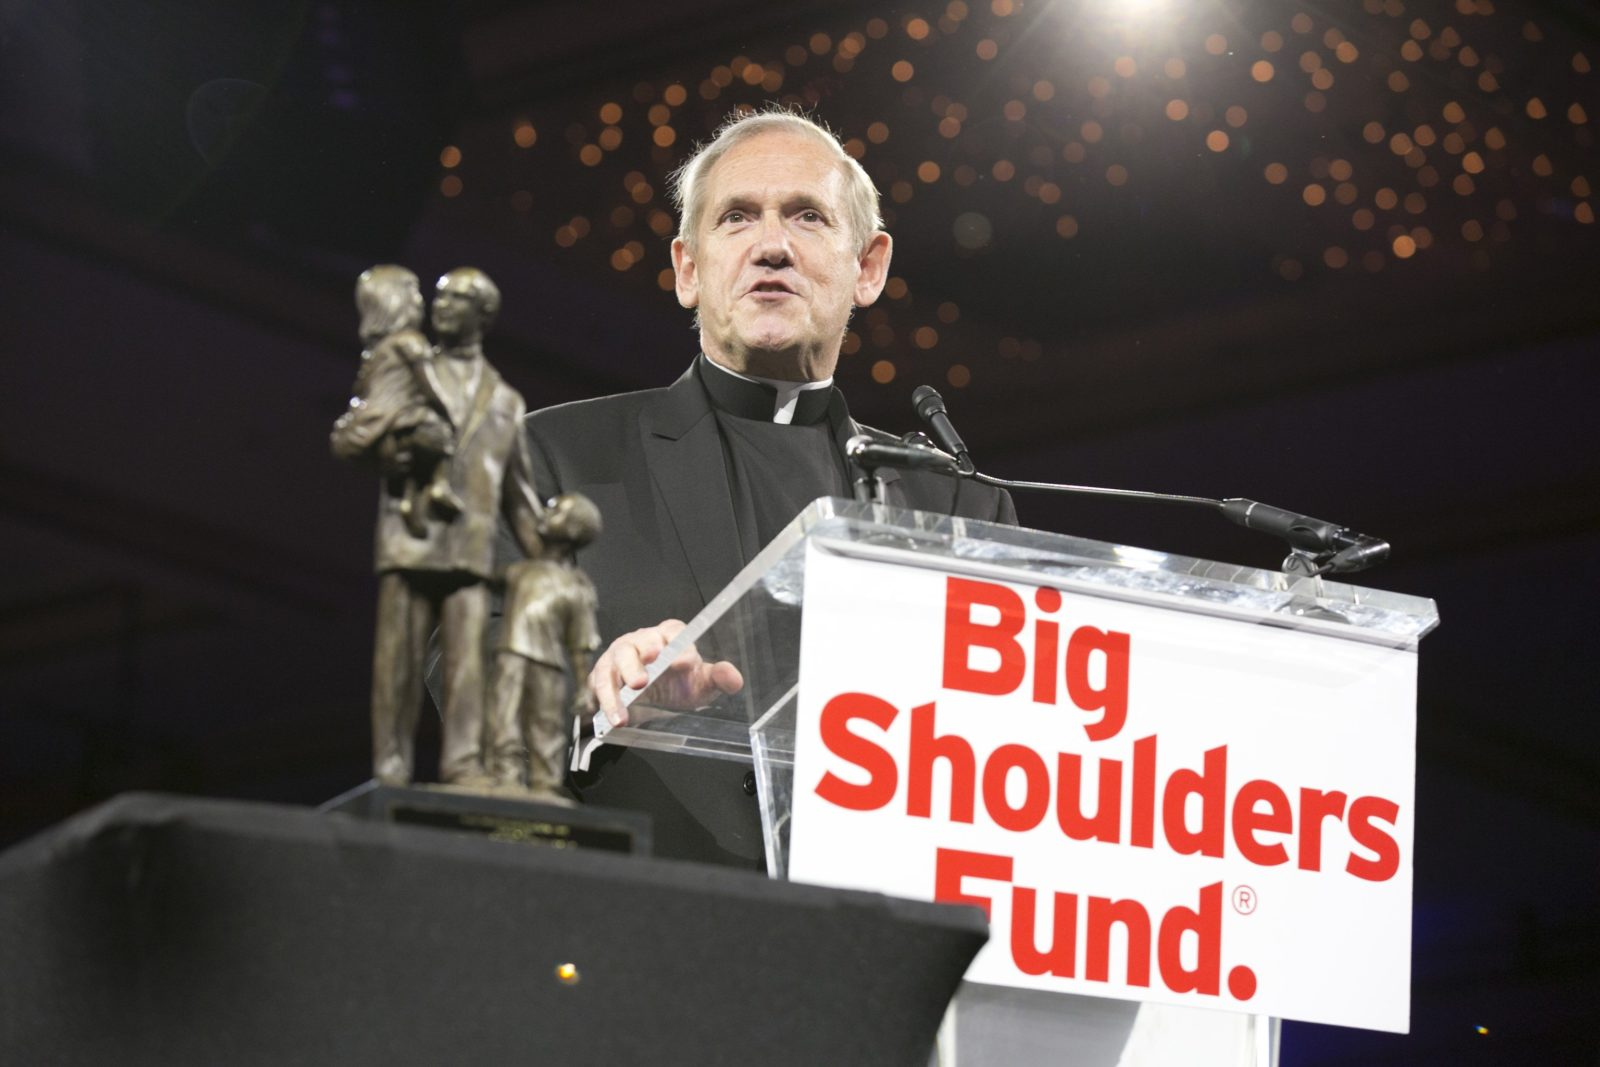 Big Shoulders Fund